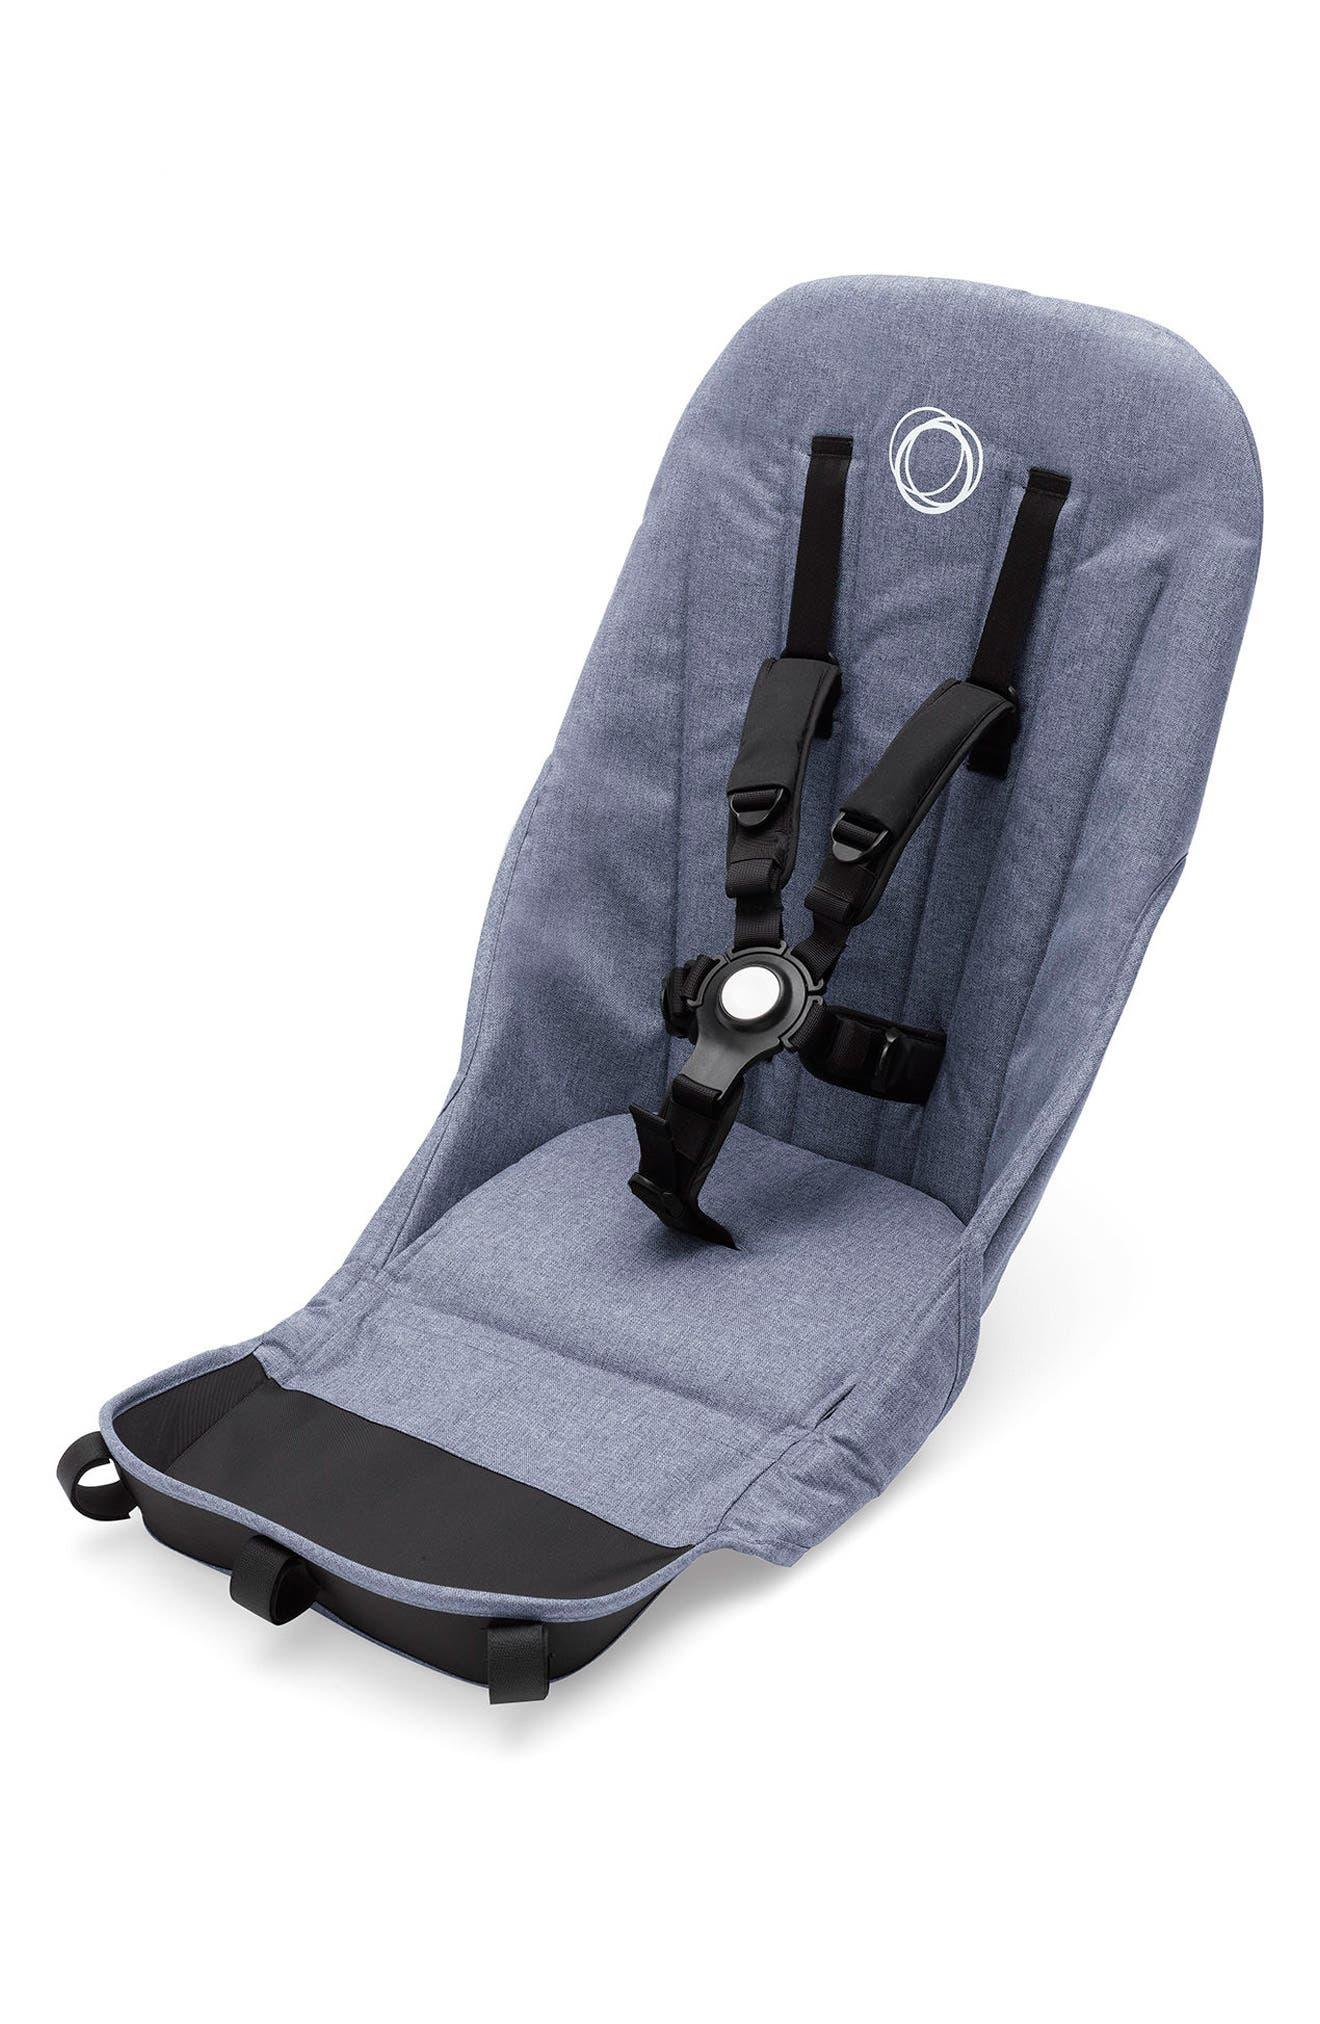 Seat Fabric for Donkey 2 Stroller,                         Main,                         color, Blue Melange